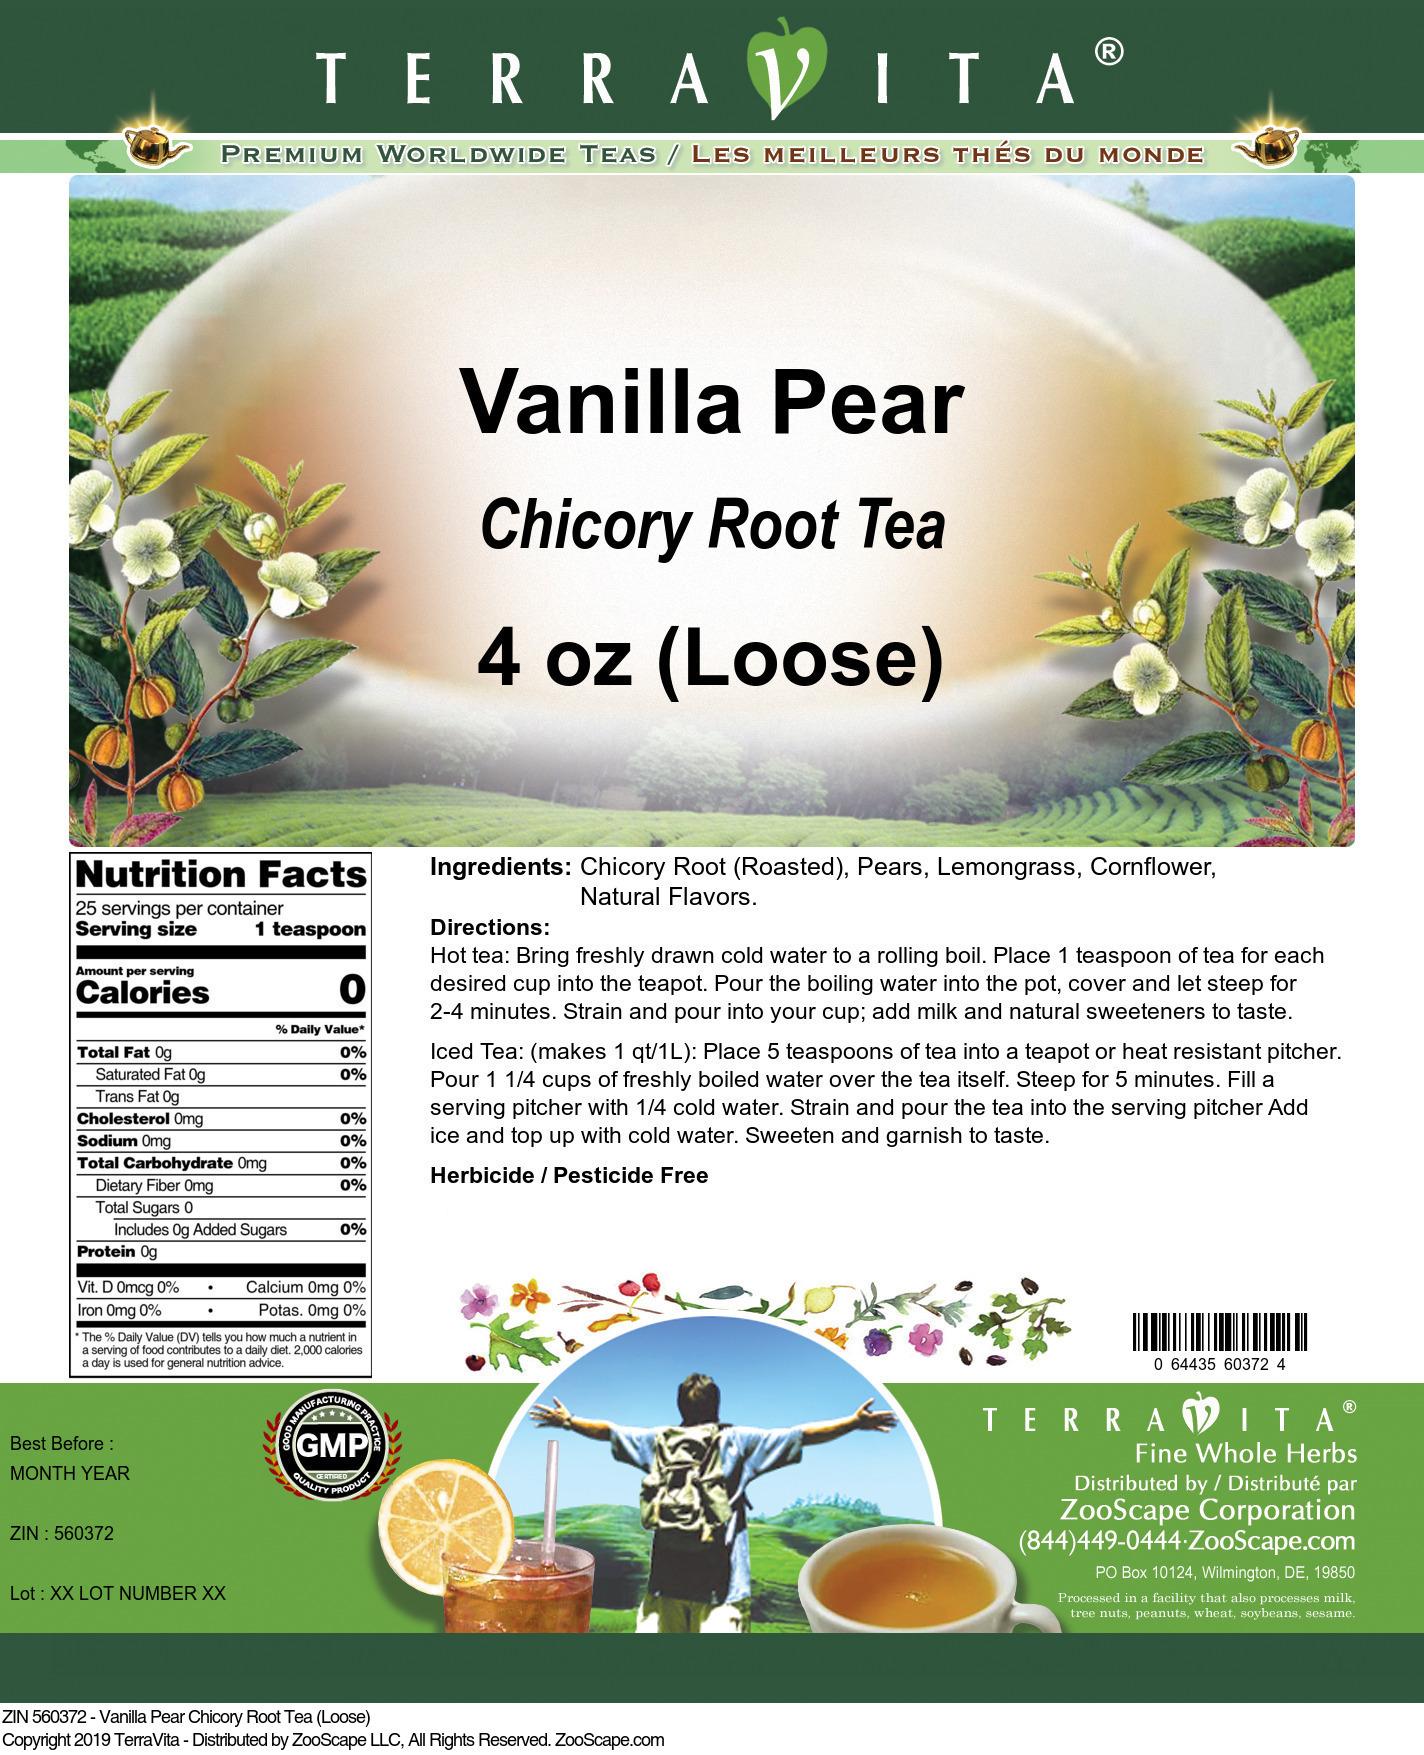 Vanilla Pear Chicory Root